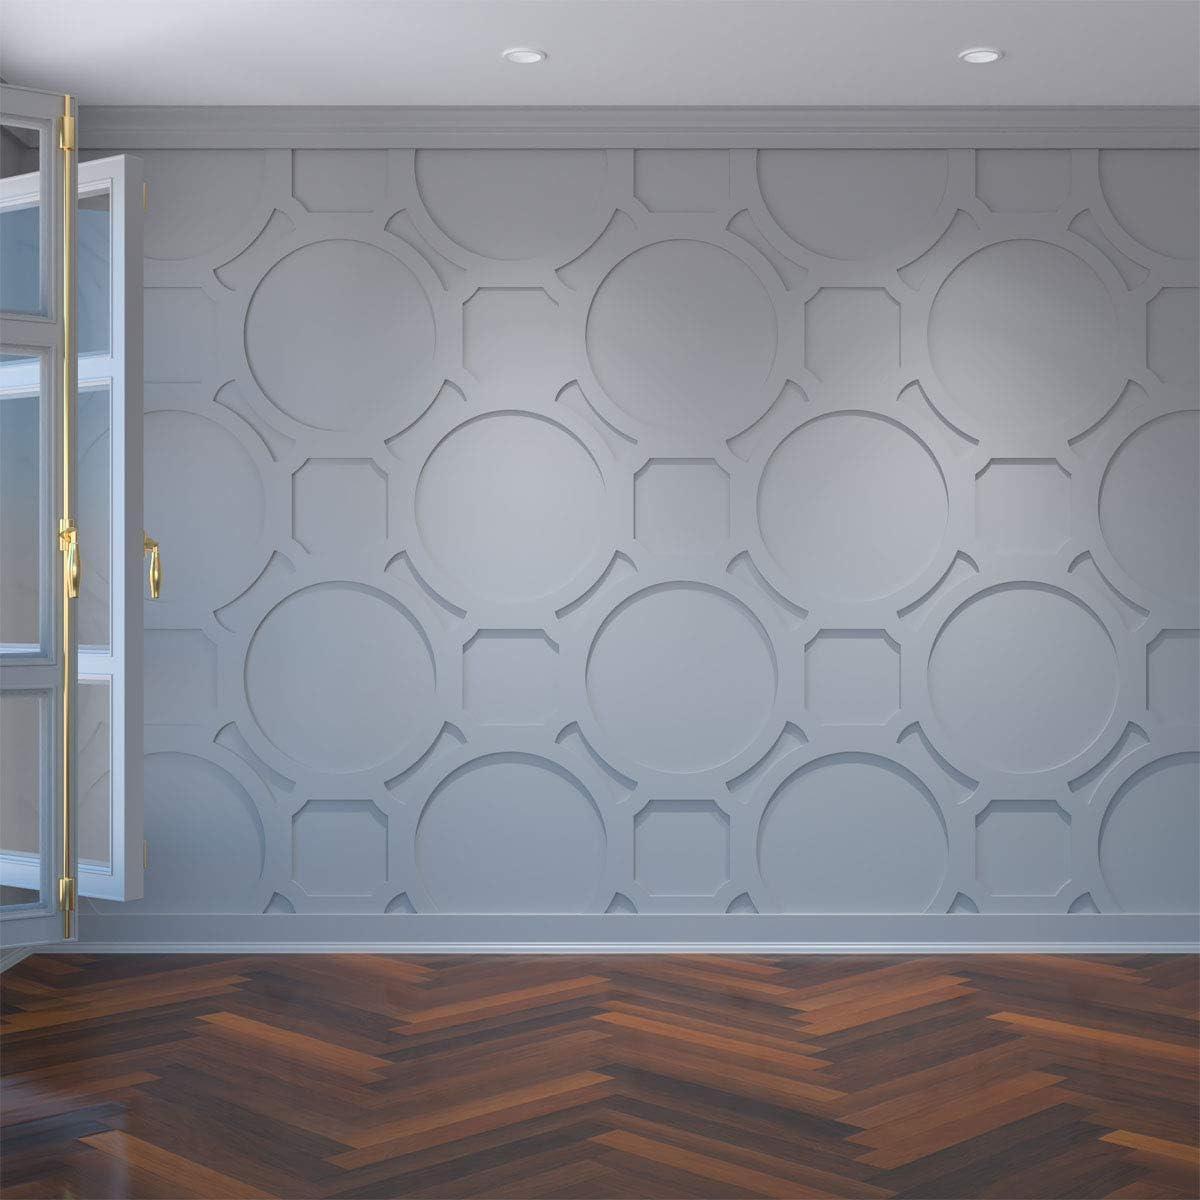 10-Pack Ekena Millwork WALP08X08HEM-CASE-10 Extra Small Hemingway Decorative Fretwork Wall Panels in Architectural Grade PVC